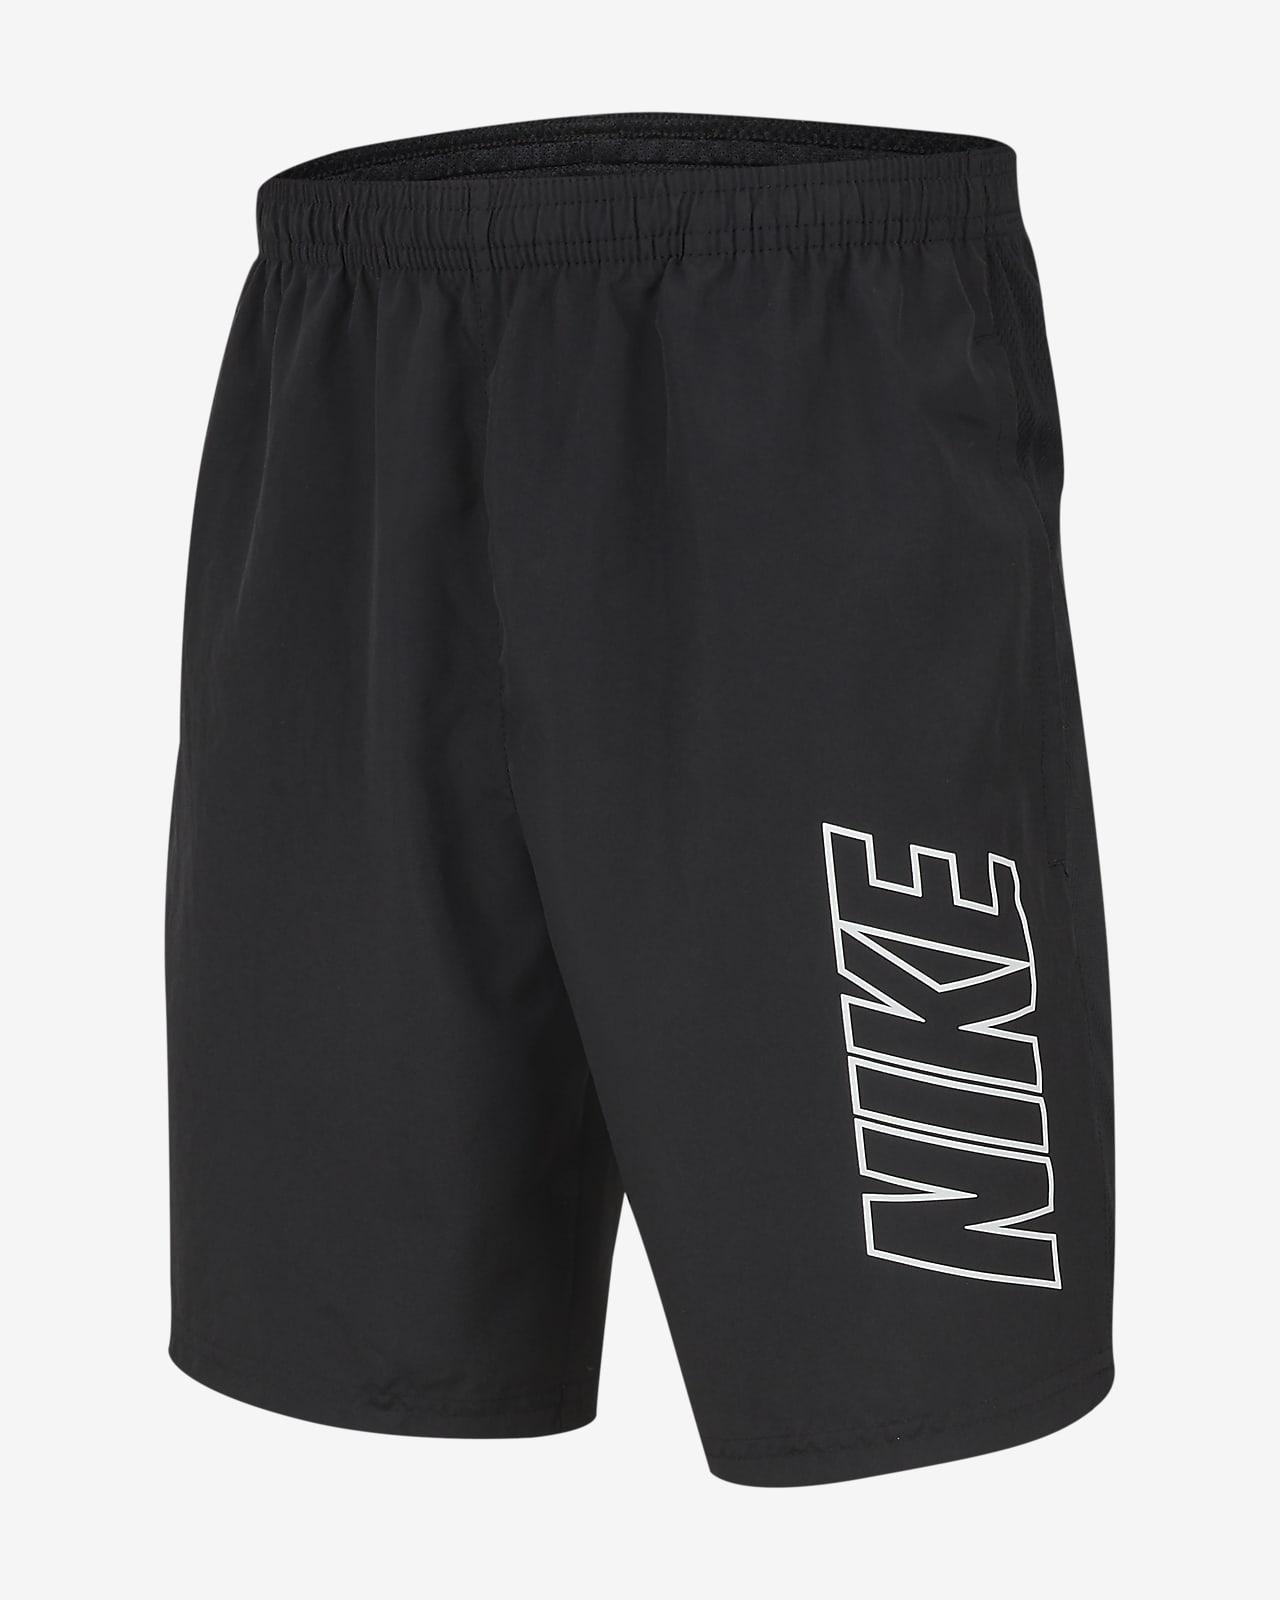 Nike Dri-FIT Academy Older Kids' Football Shorts